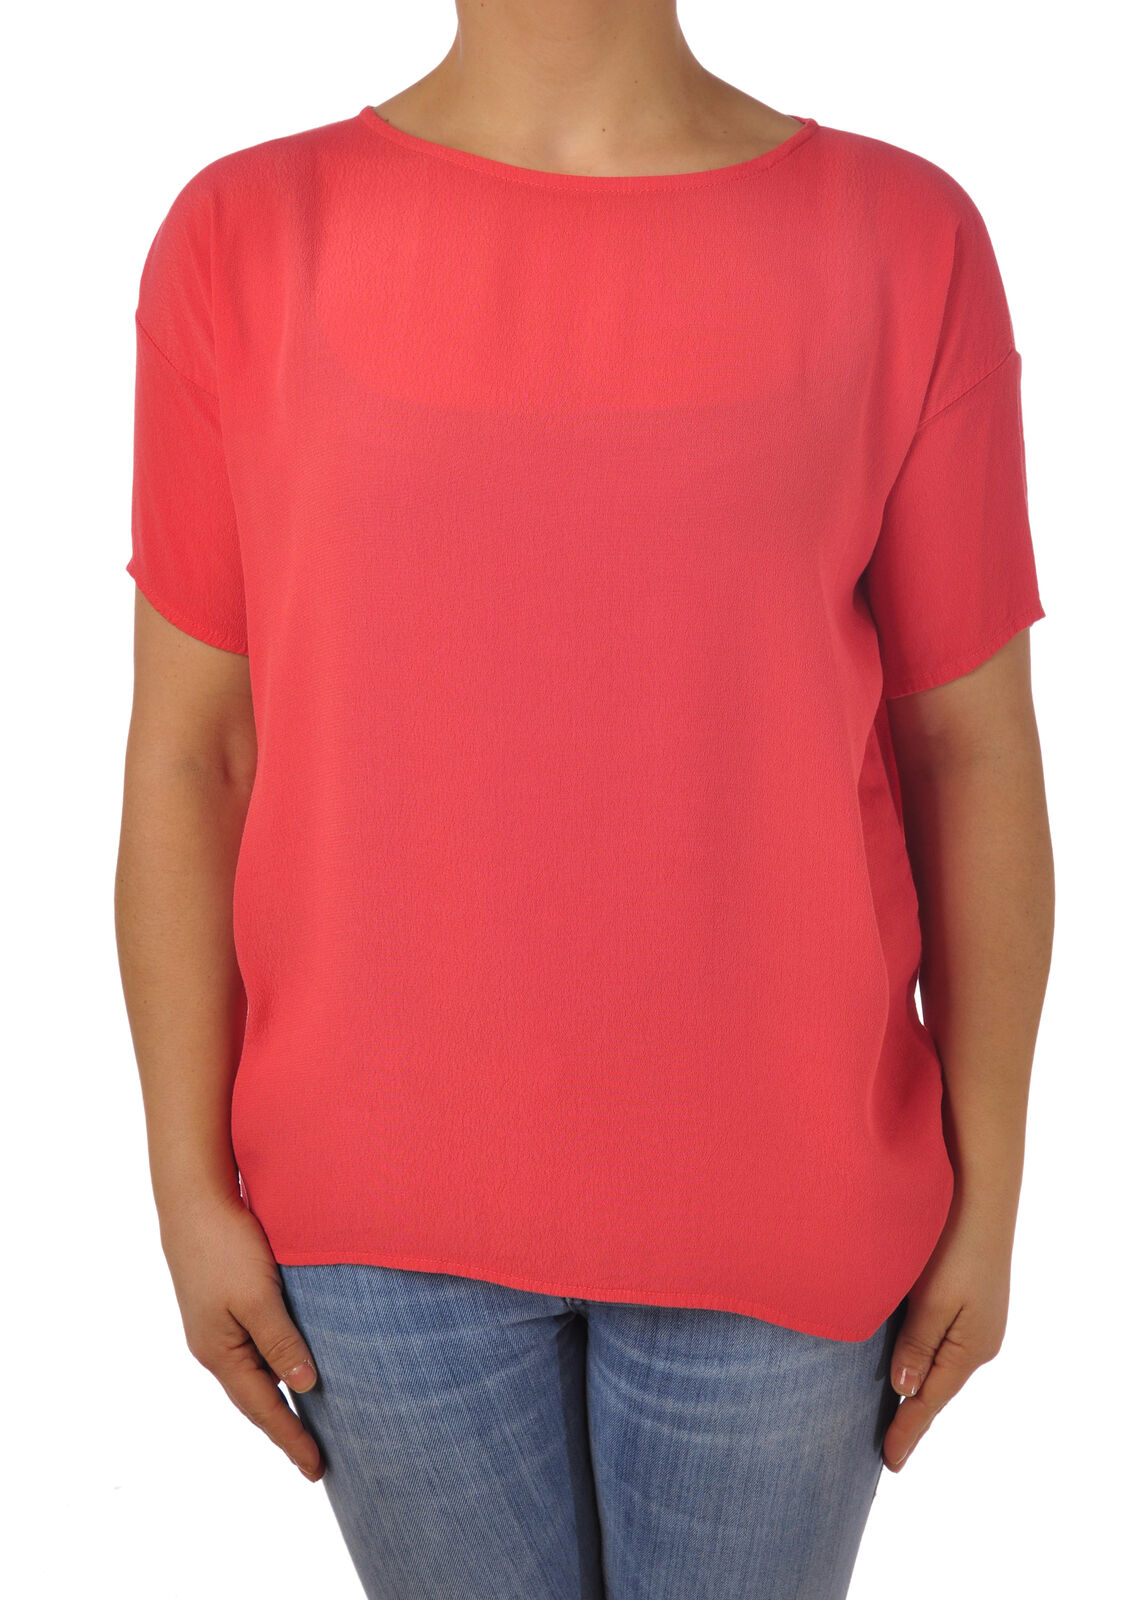 CROSSLEY - Shirts-Blouses - Woman - Rosa - 5087412F184050